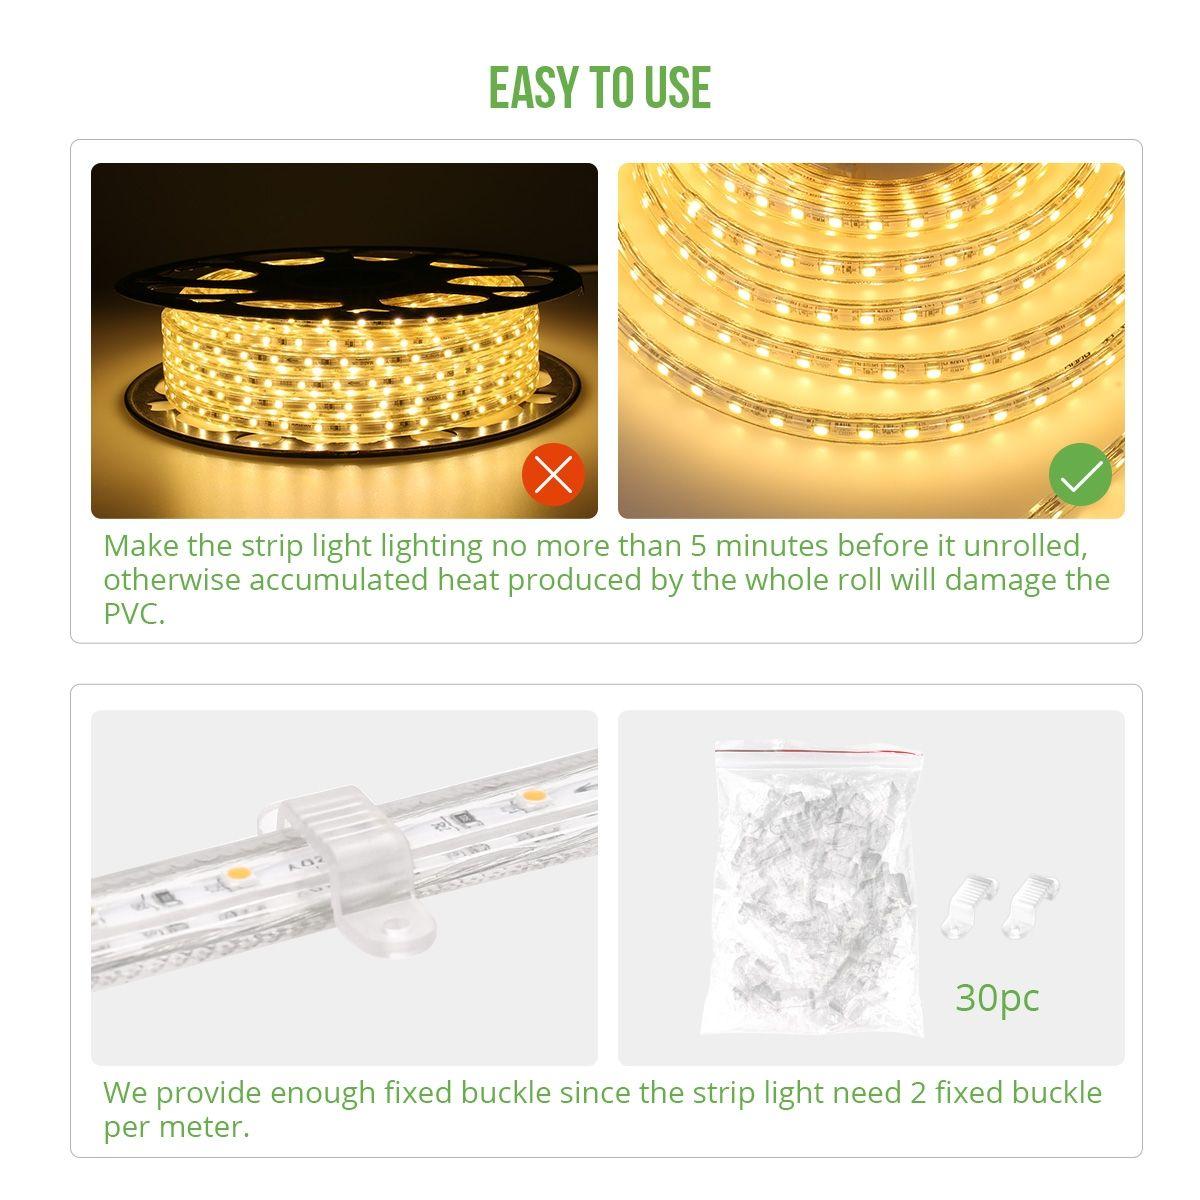 Le 49ft Led Strip Lights 120 Volt 70w 900 Smd 3528 Leds Waterproof Flexible Warm White Etl Listed Led Strip Lighting Strip Lighting Waterproof Led Lights